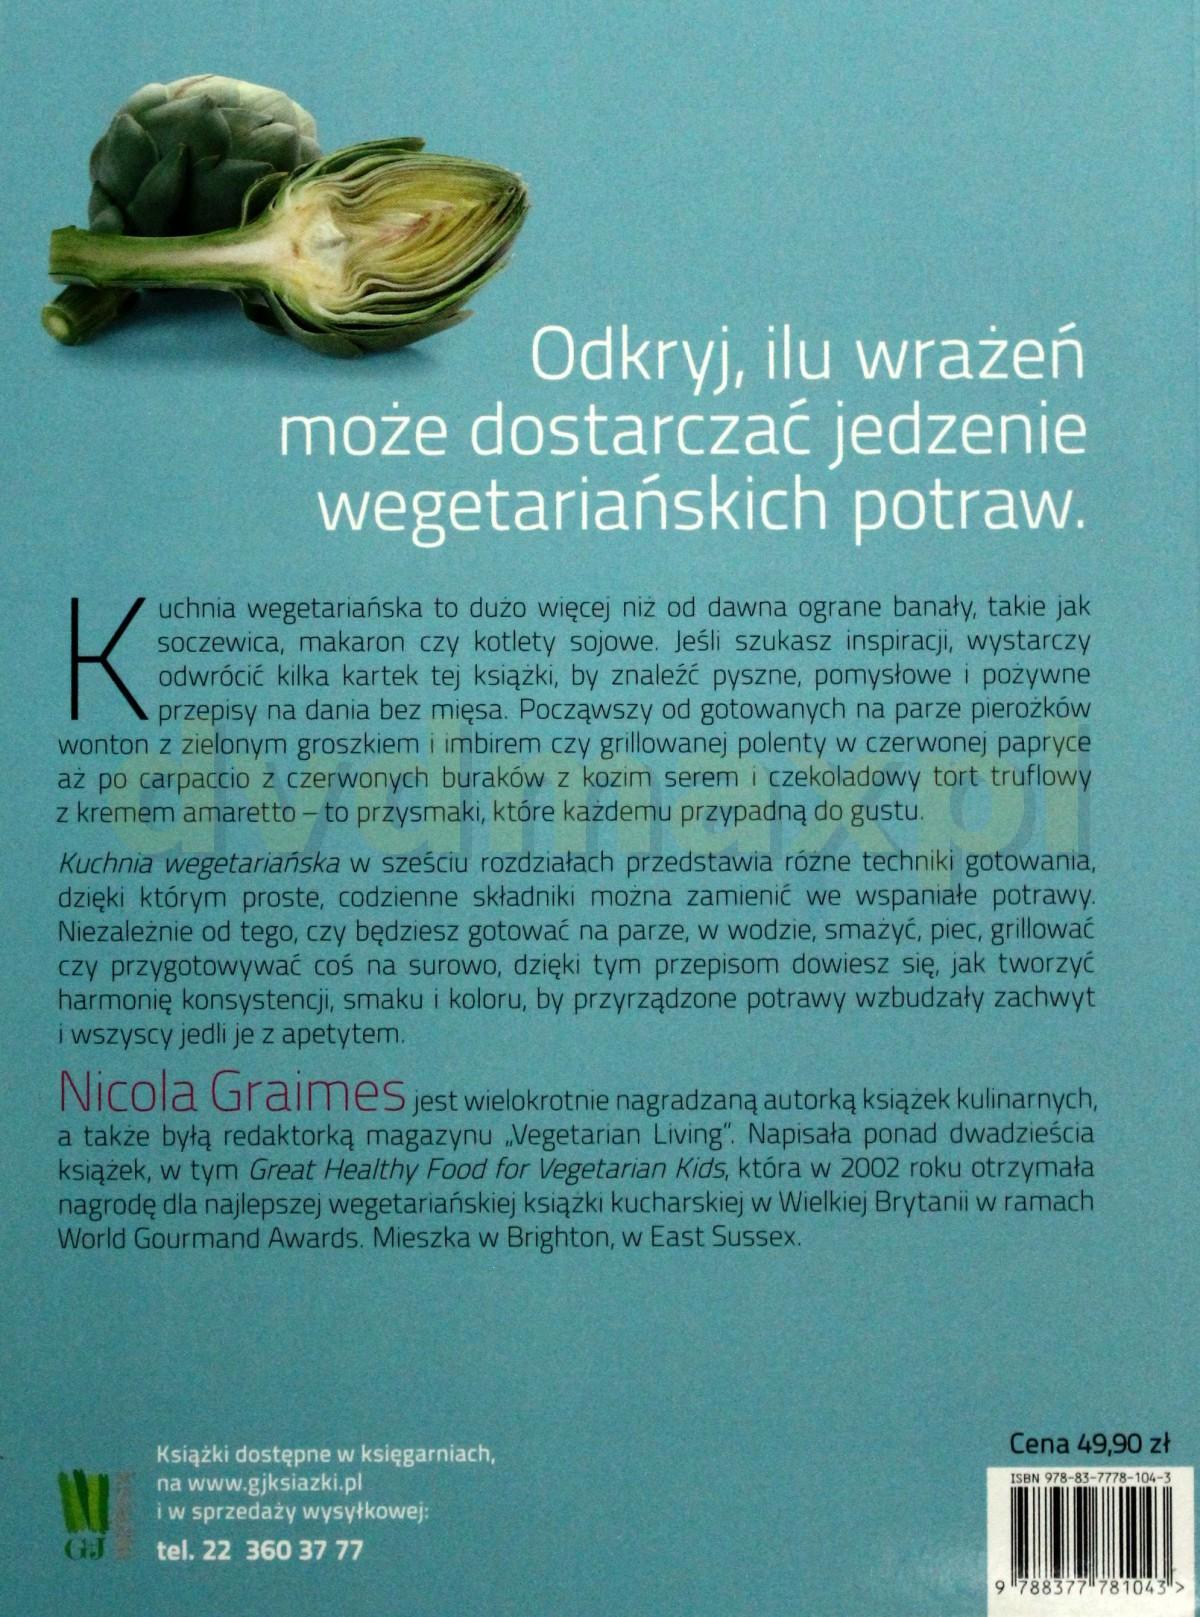 Sklep Punkt44 Pl Kuchnia Wegetarianska Nicola Graimes Ksiazka